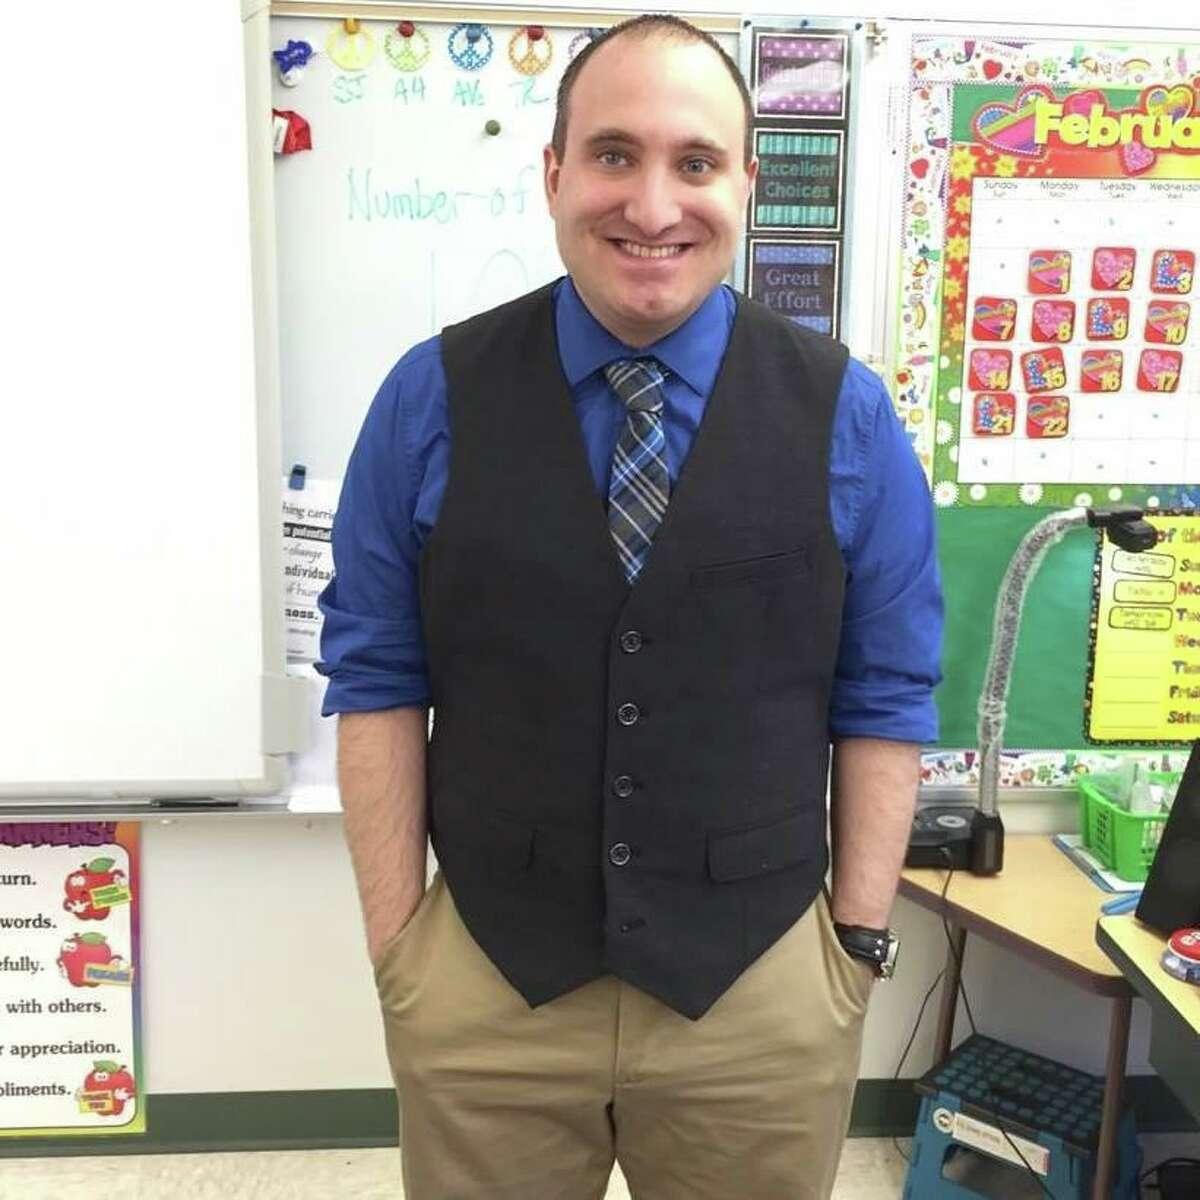 Matthew Calvanese, a fourth-grade math teacher at the Academy of International Studies, was named Danbury Public Schools' 2019-20 Teacher of the Year.